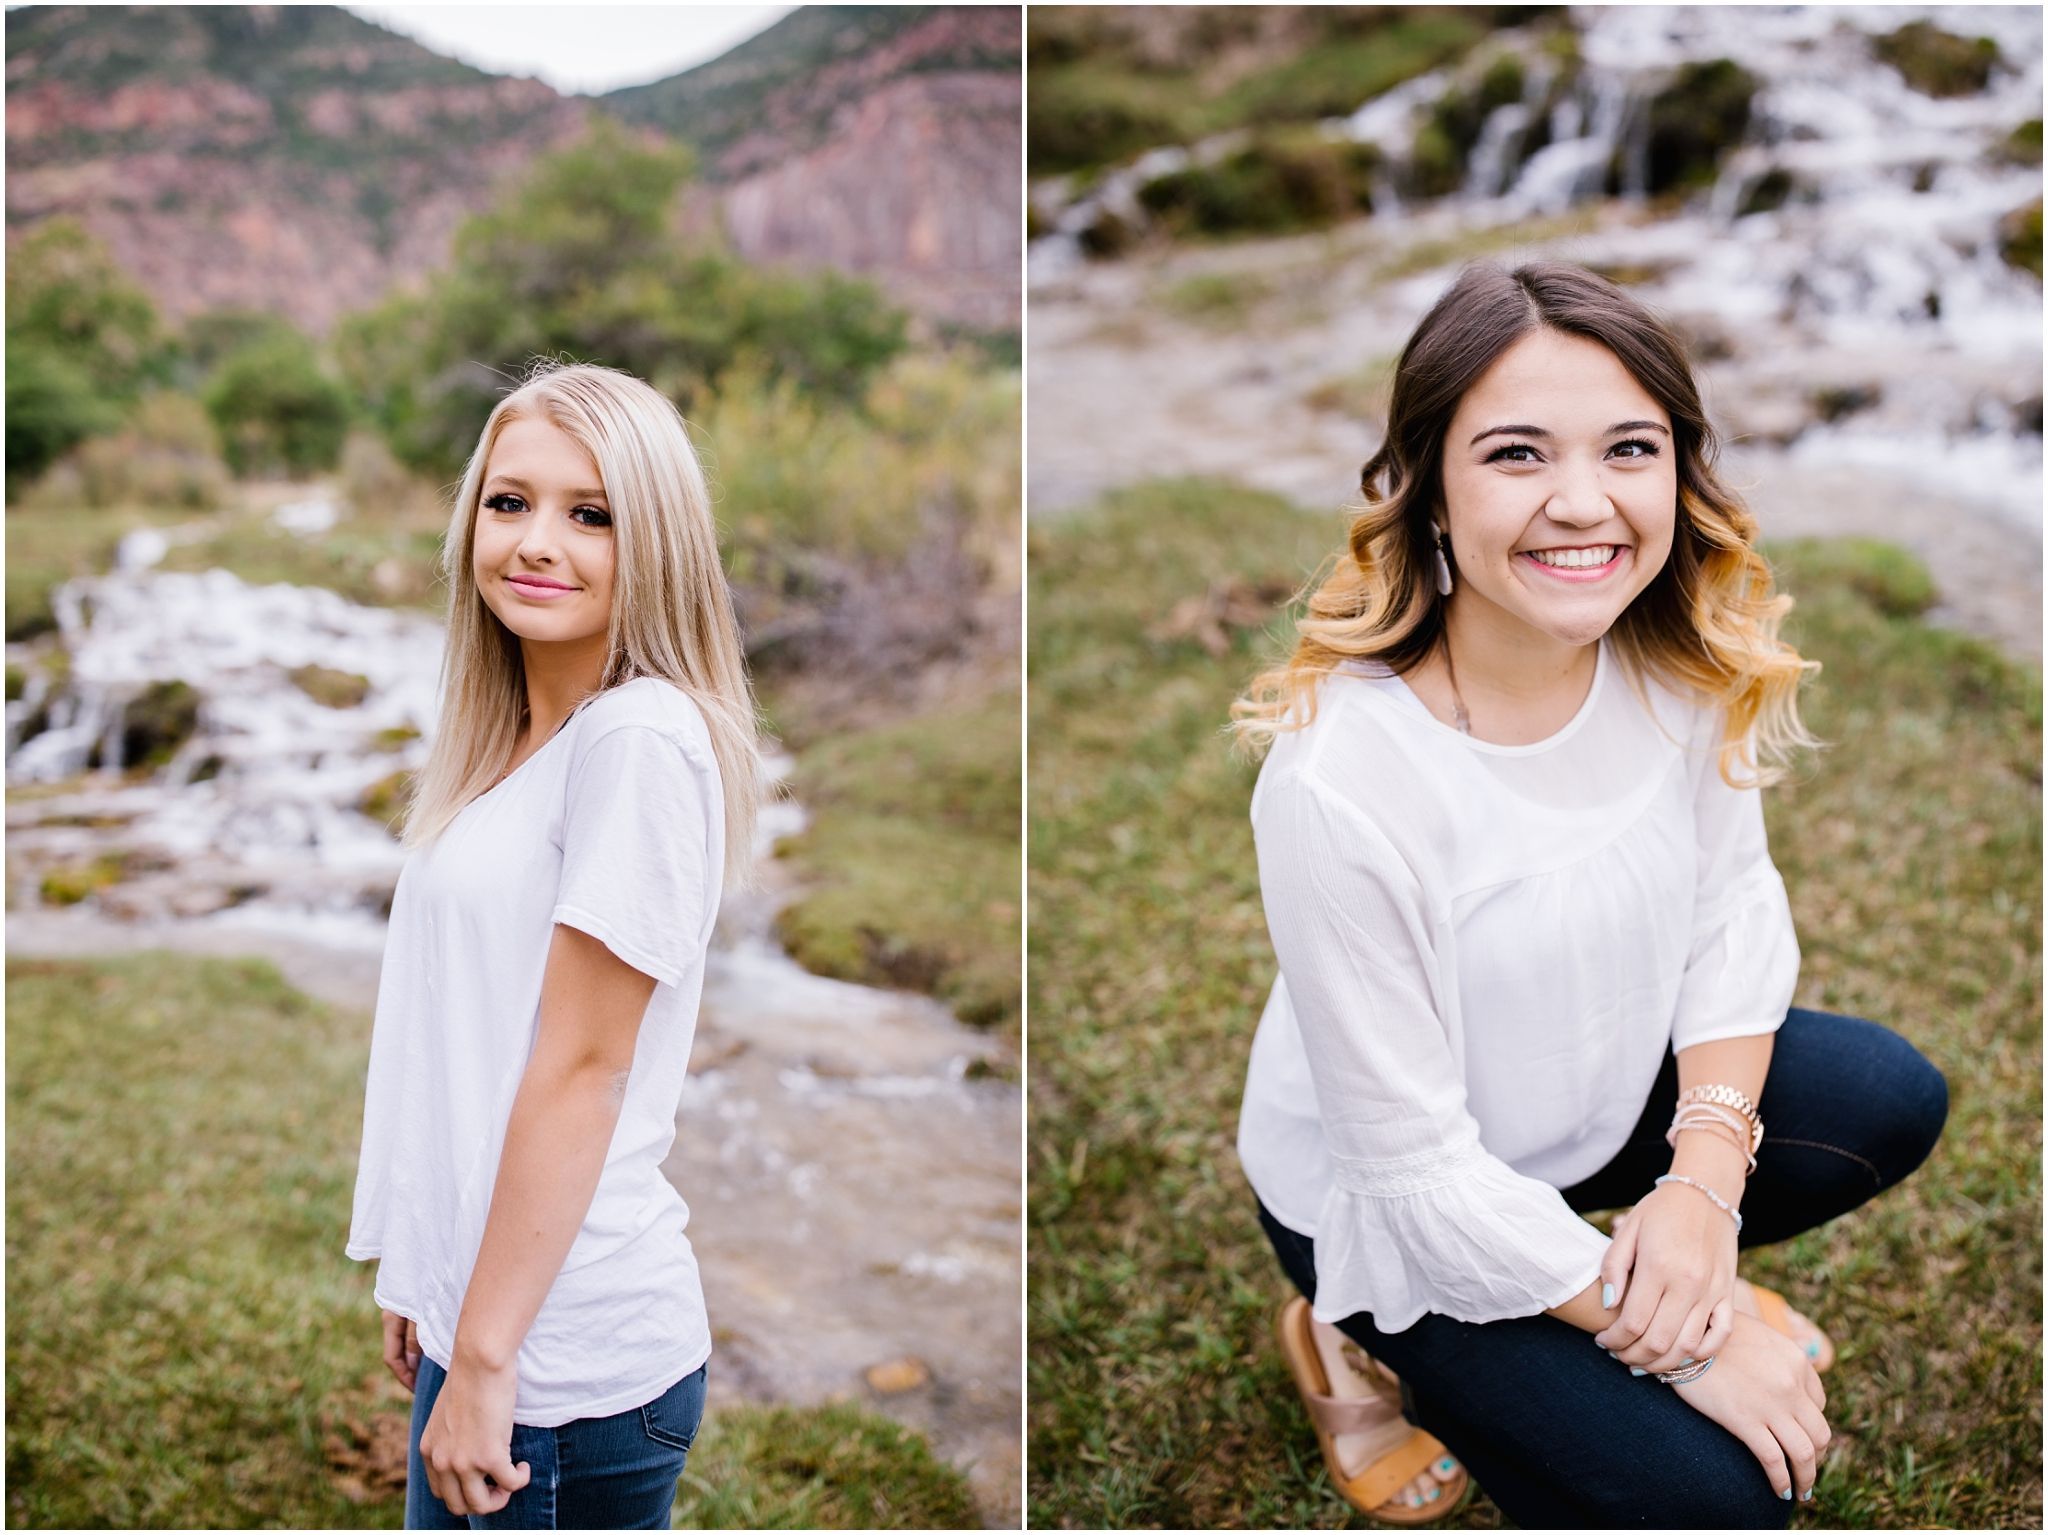 GVHSDRILL-105_Lizzie-B-Imagery-Utah-Family-Photographer-Central-Utah-Park-City-Salt-Lake-City-Drill-Team-Photography-Dance.jpg